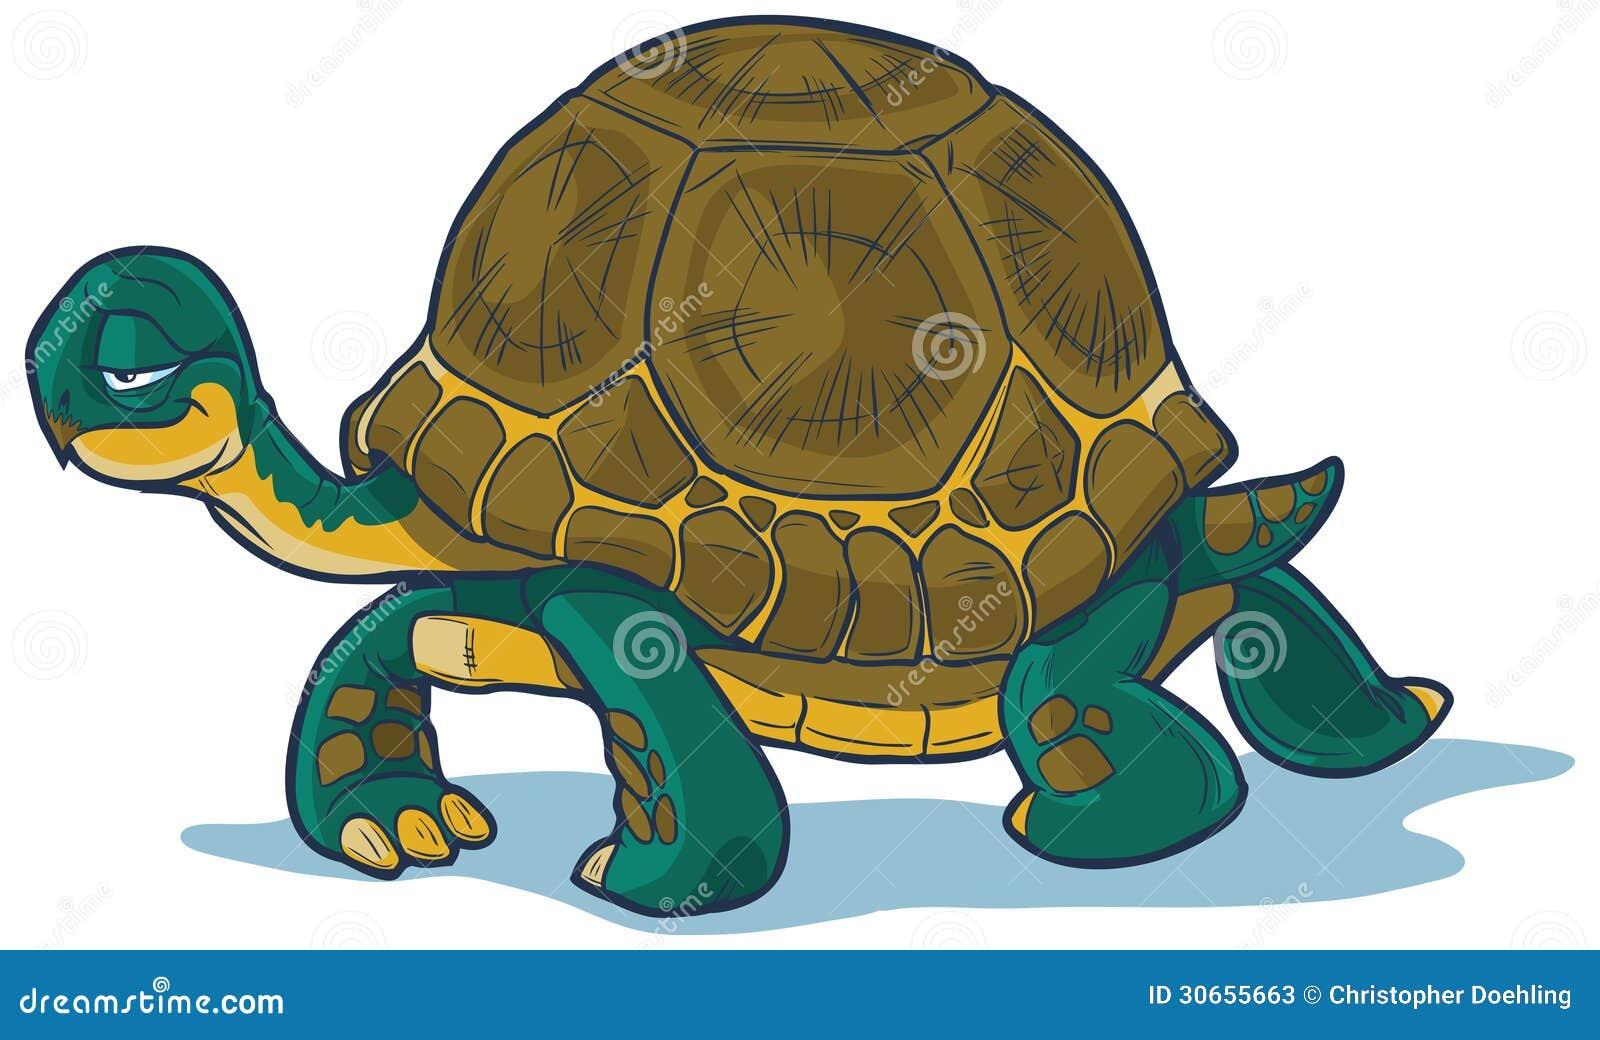 Turtle Cartoon Images Stock Photos amp Vectors  Shutterstock